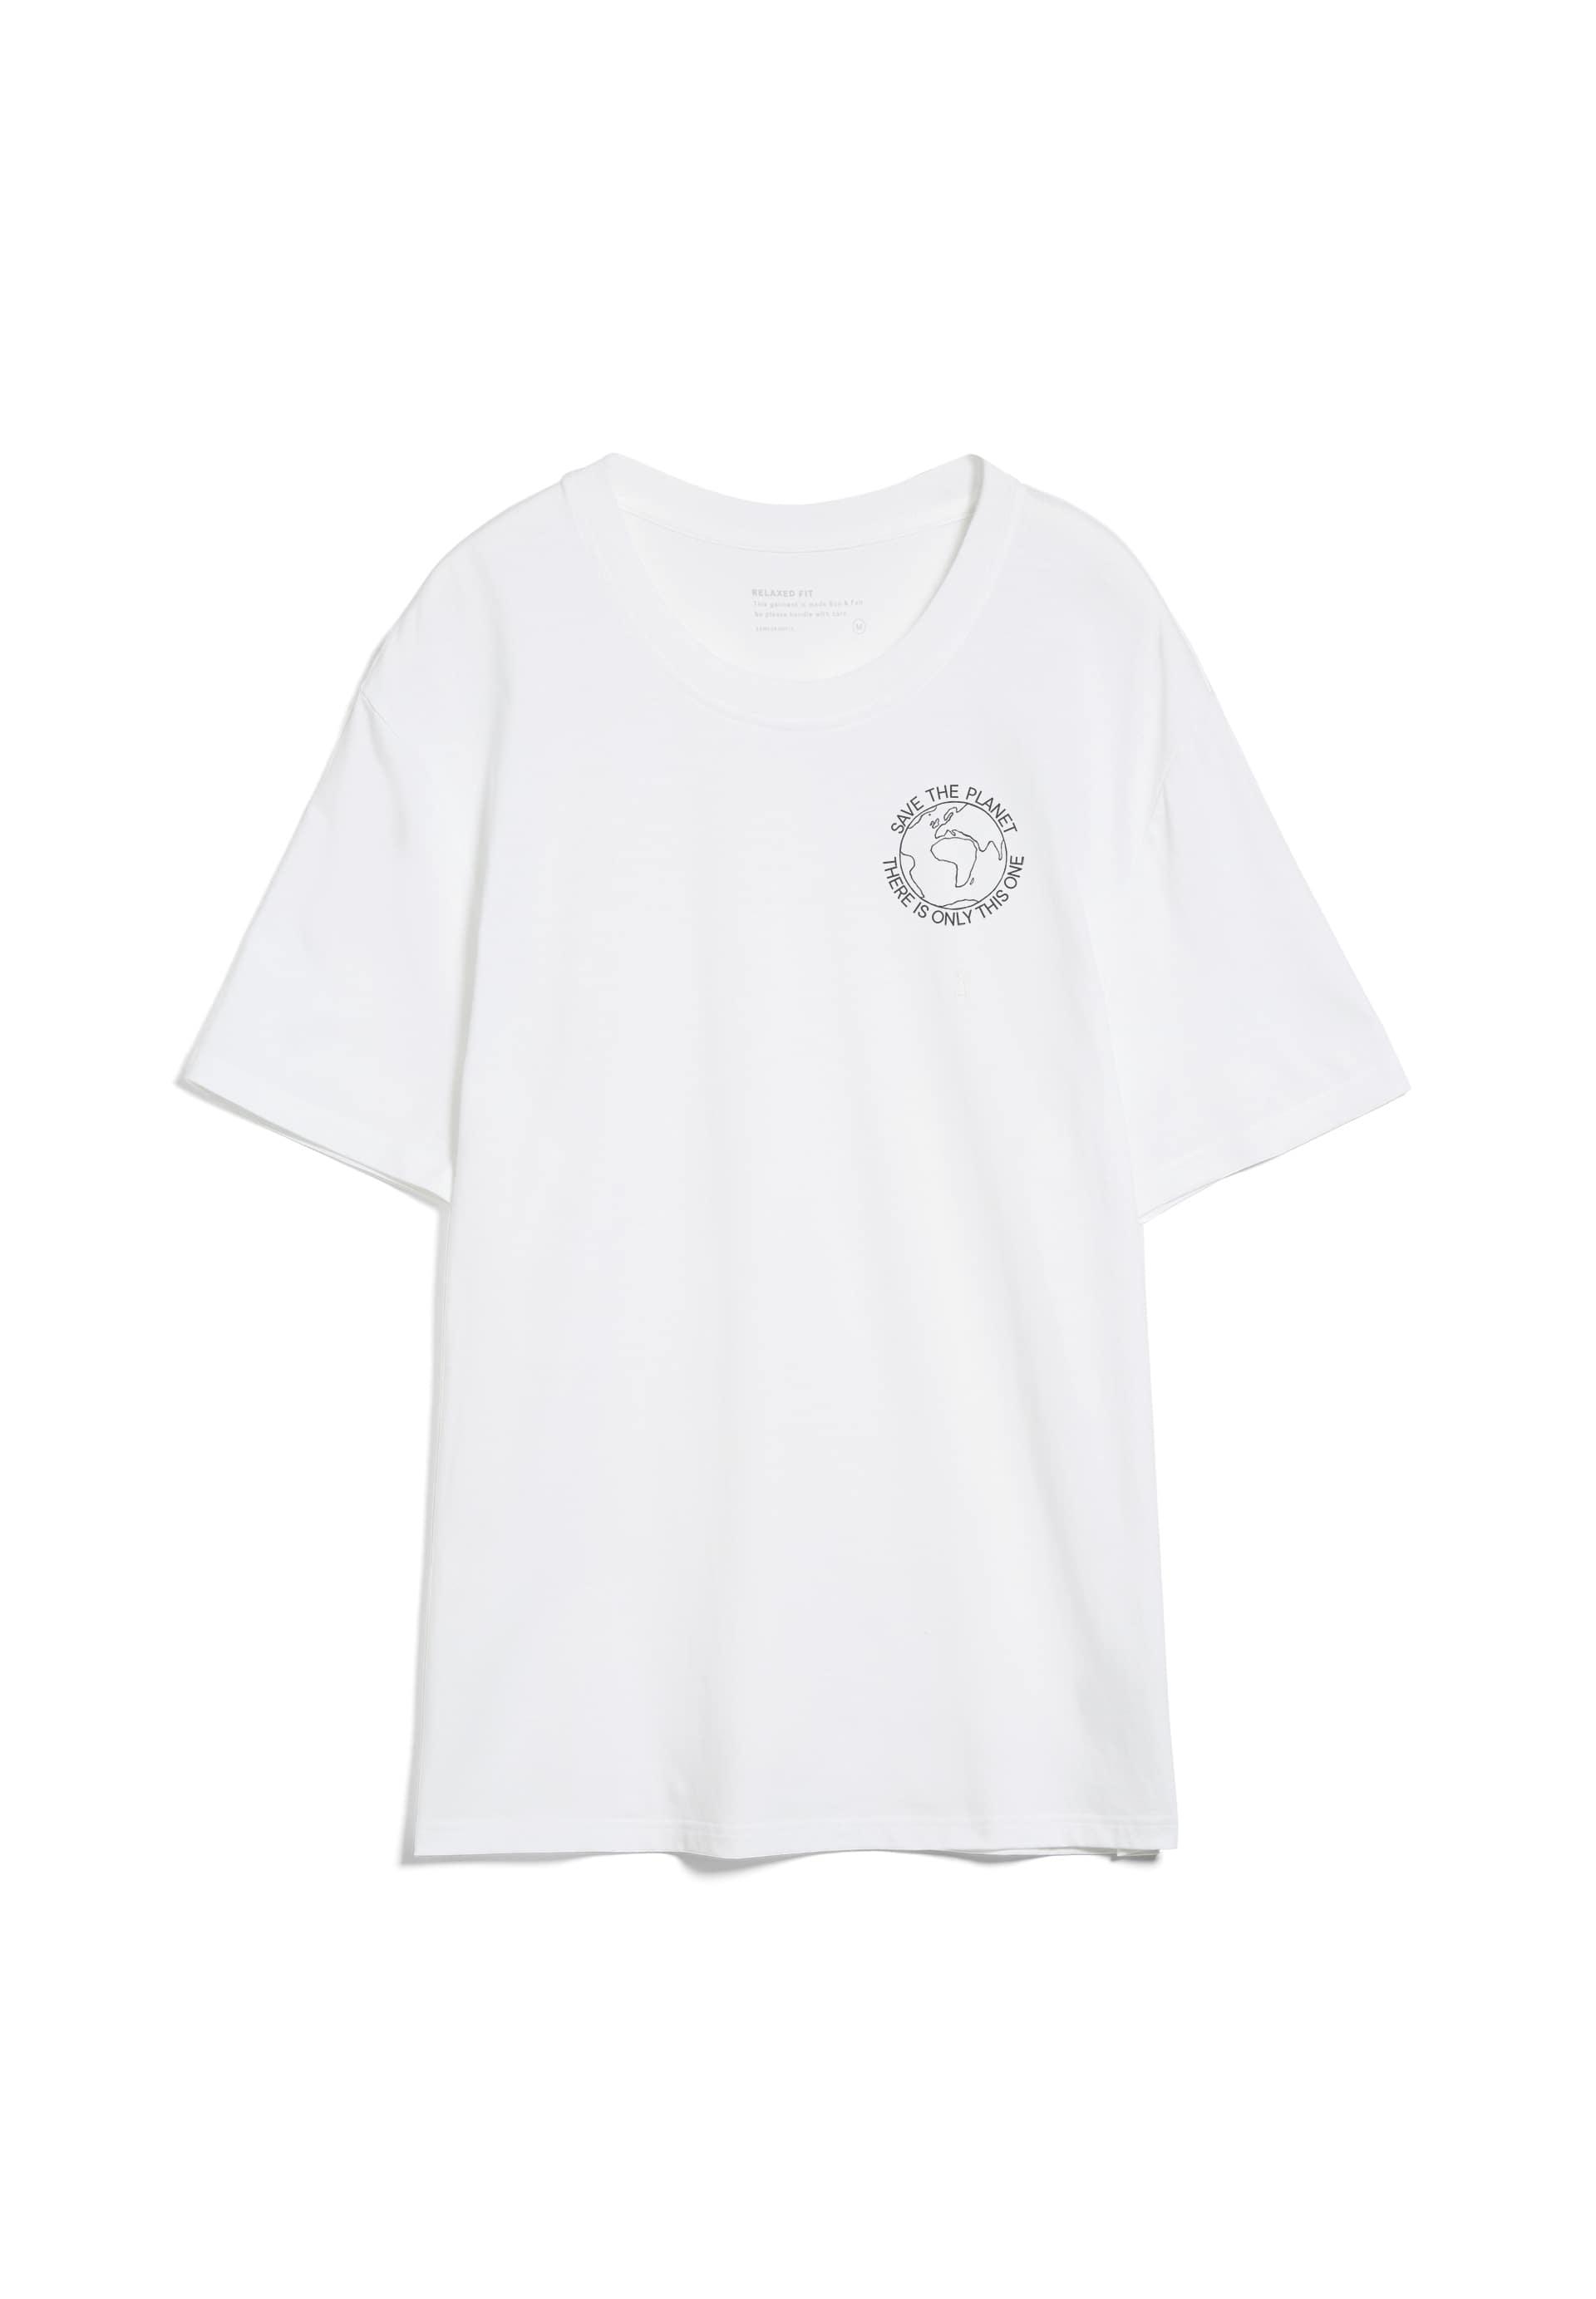 AADO SAVE THE PLANET T-Shirt aus Bio-Baumwolle